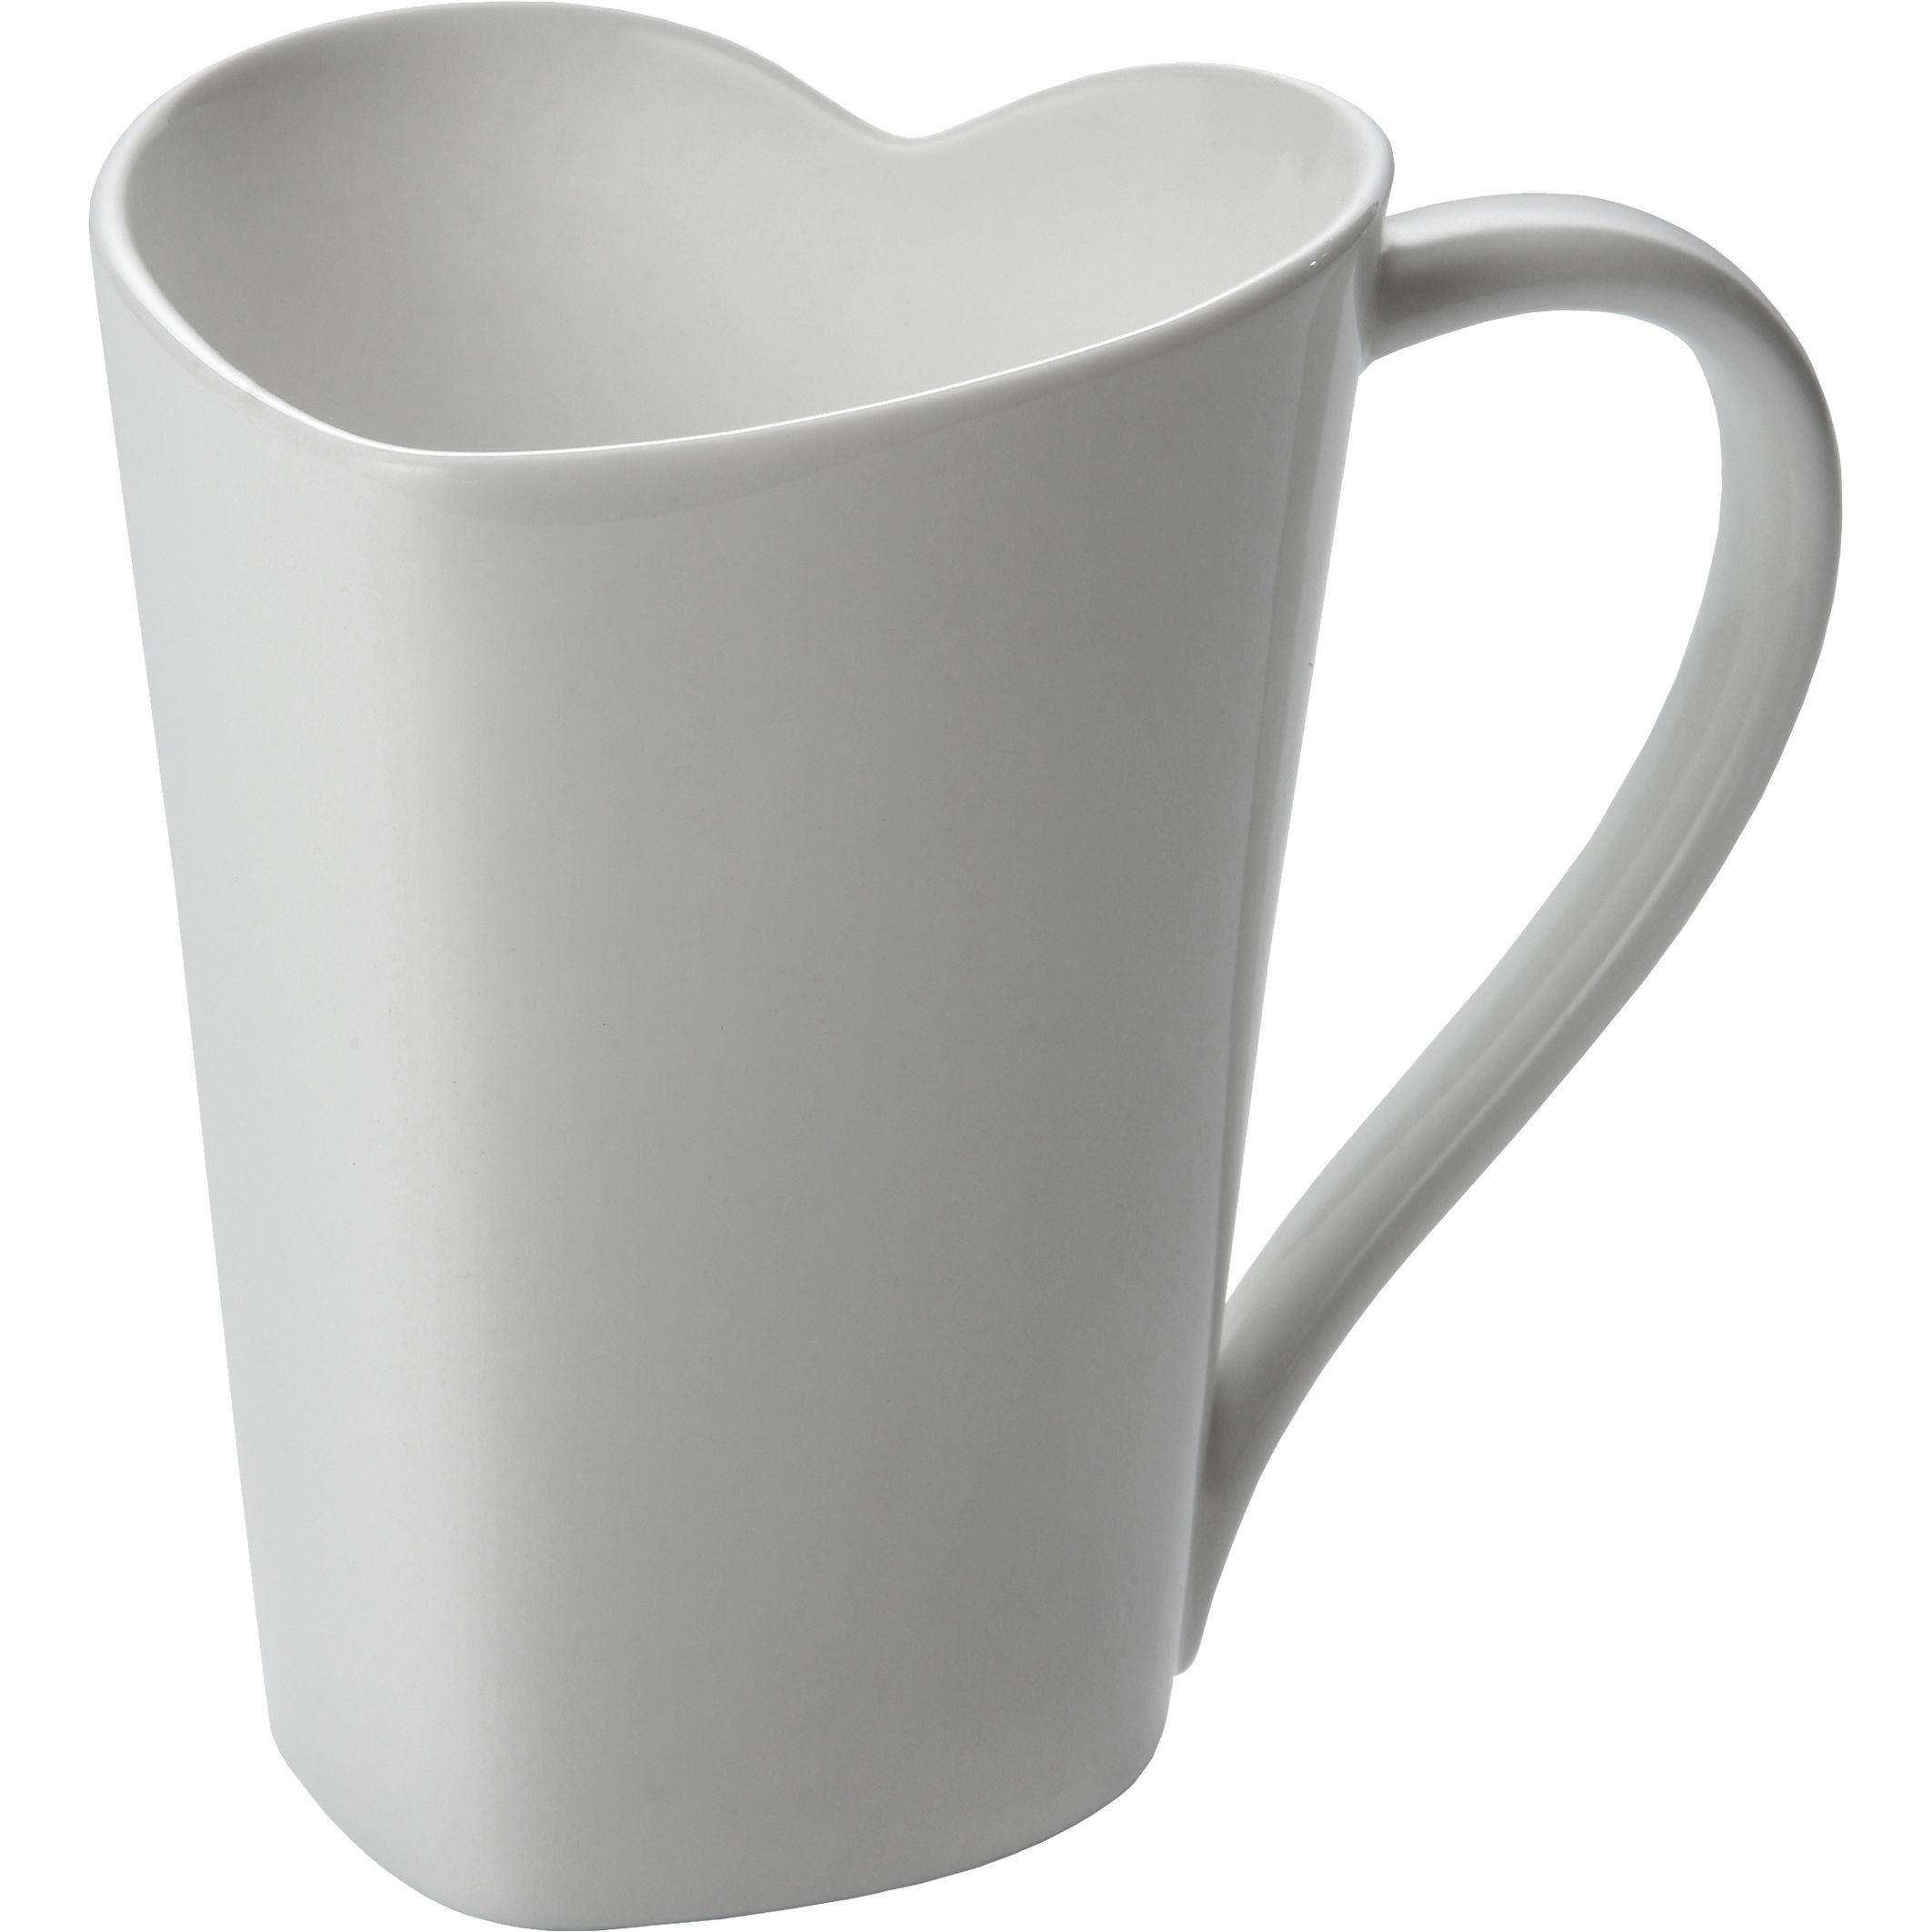 Arts de la table - Tasses et mugs - Mug To - Alessi - Blanc - Céramique